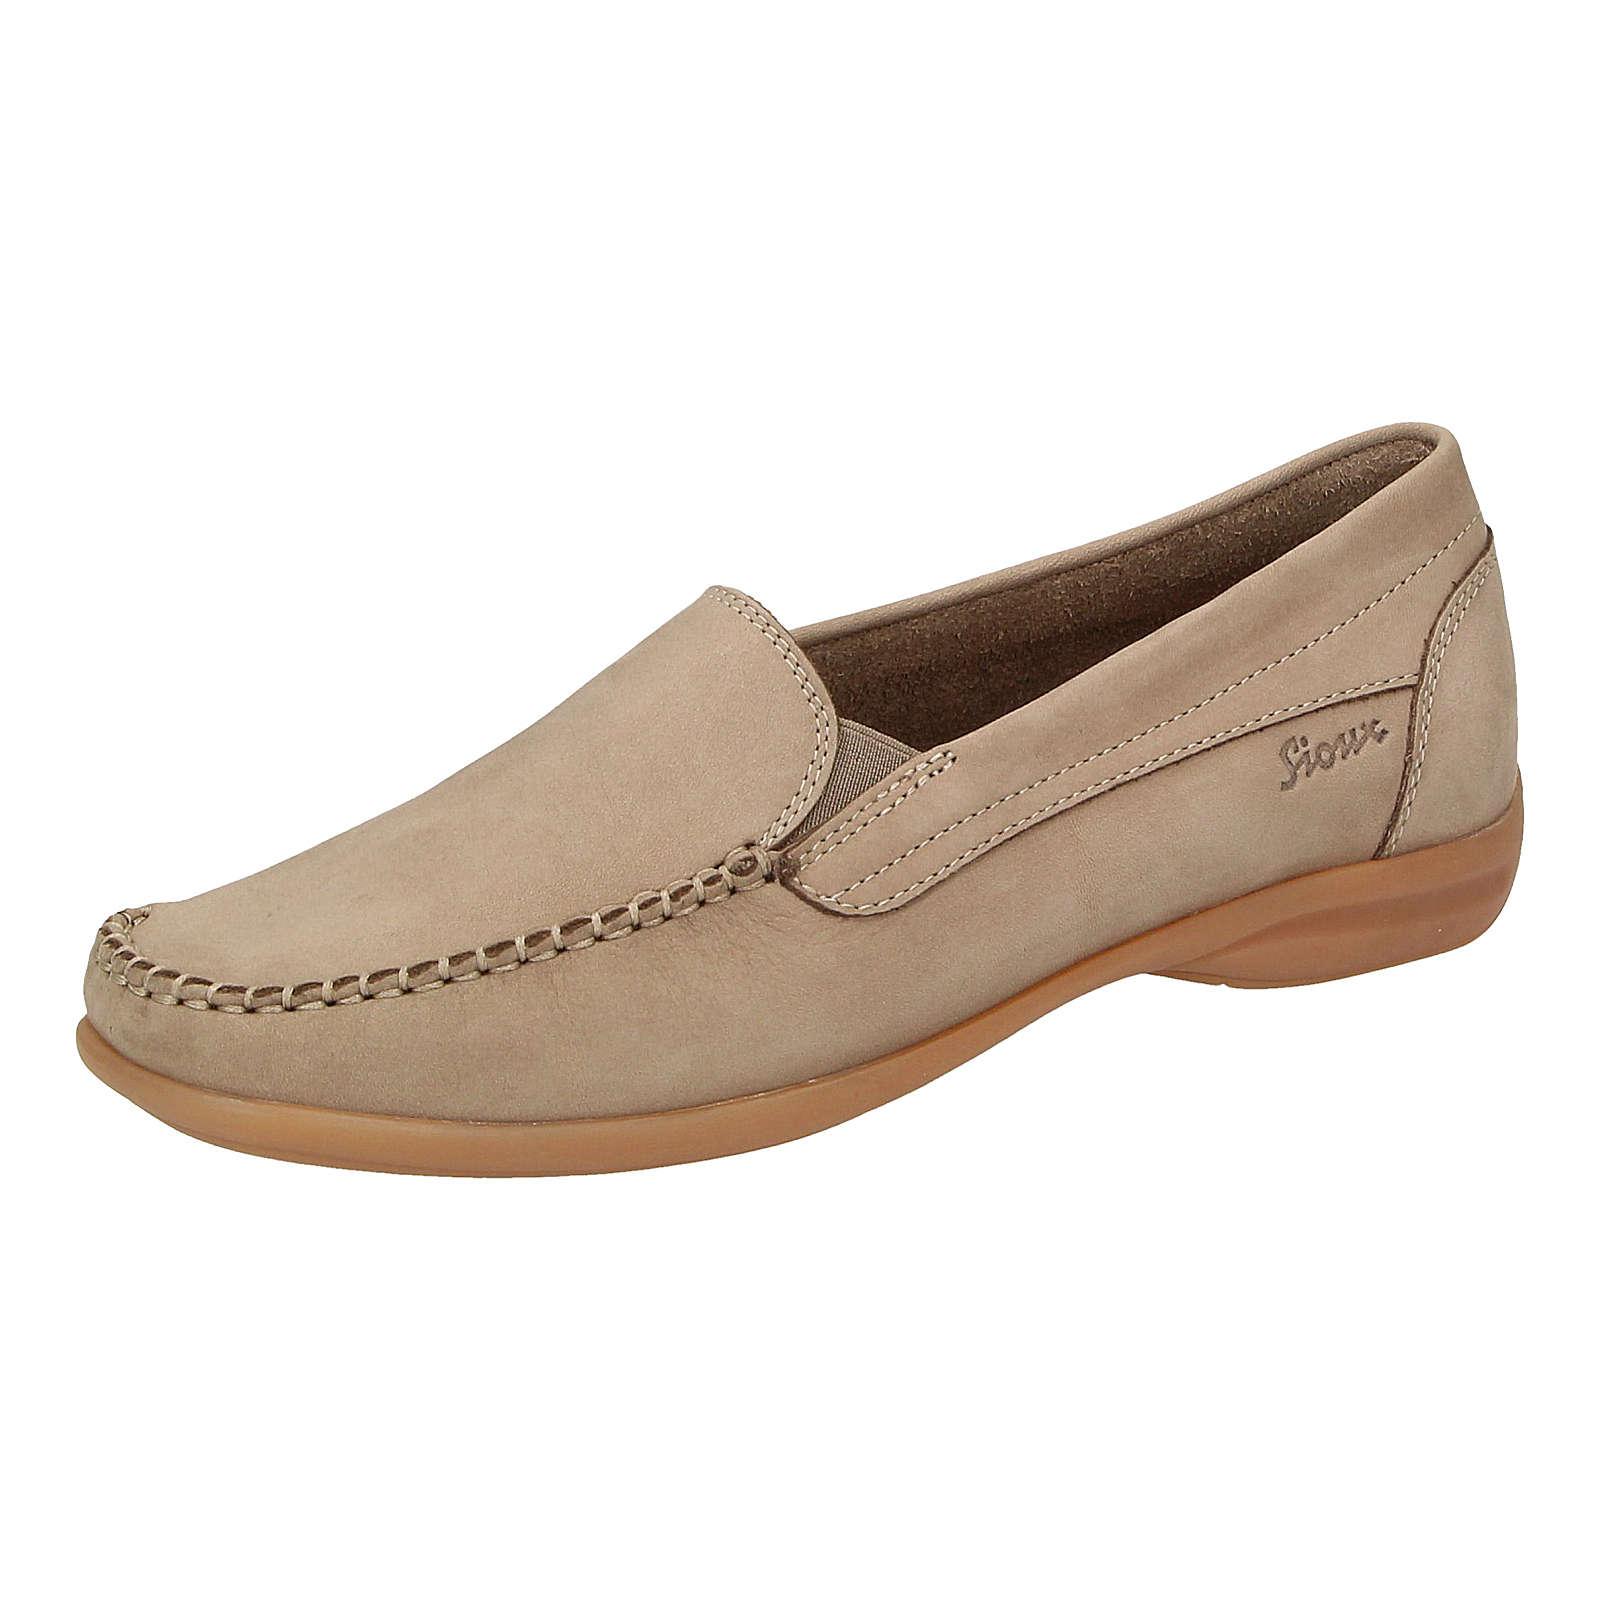 Rabatt-Preisvergleich.de - Schuhe   Slipper   Mokassins 3fcd147f17